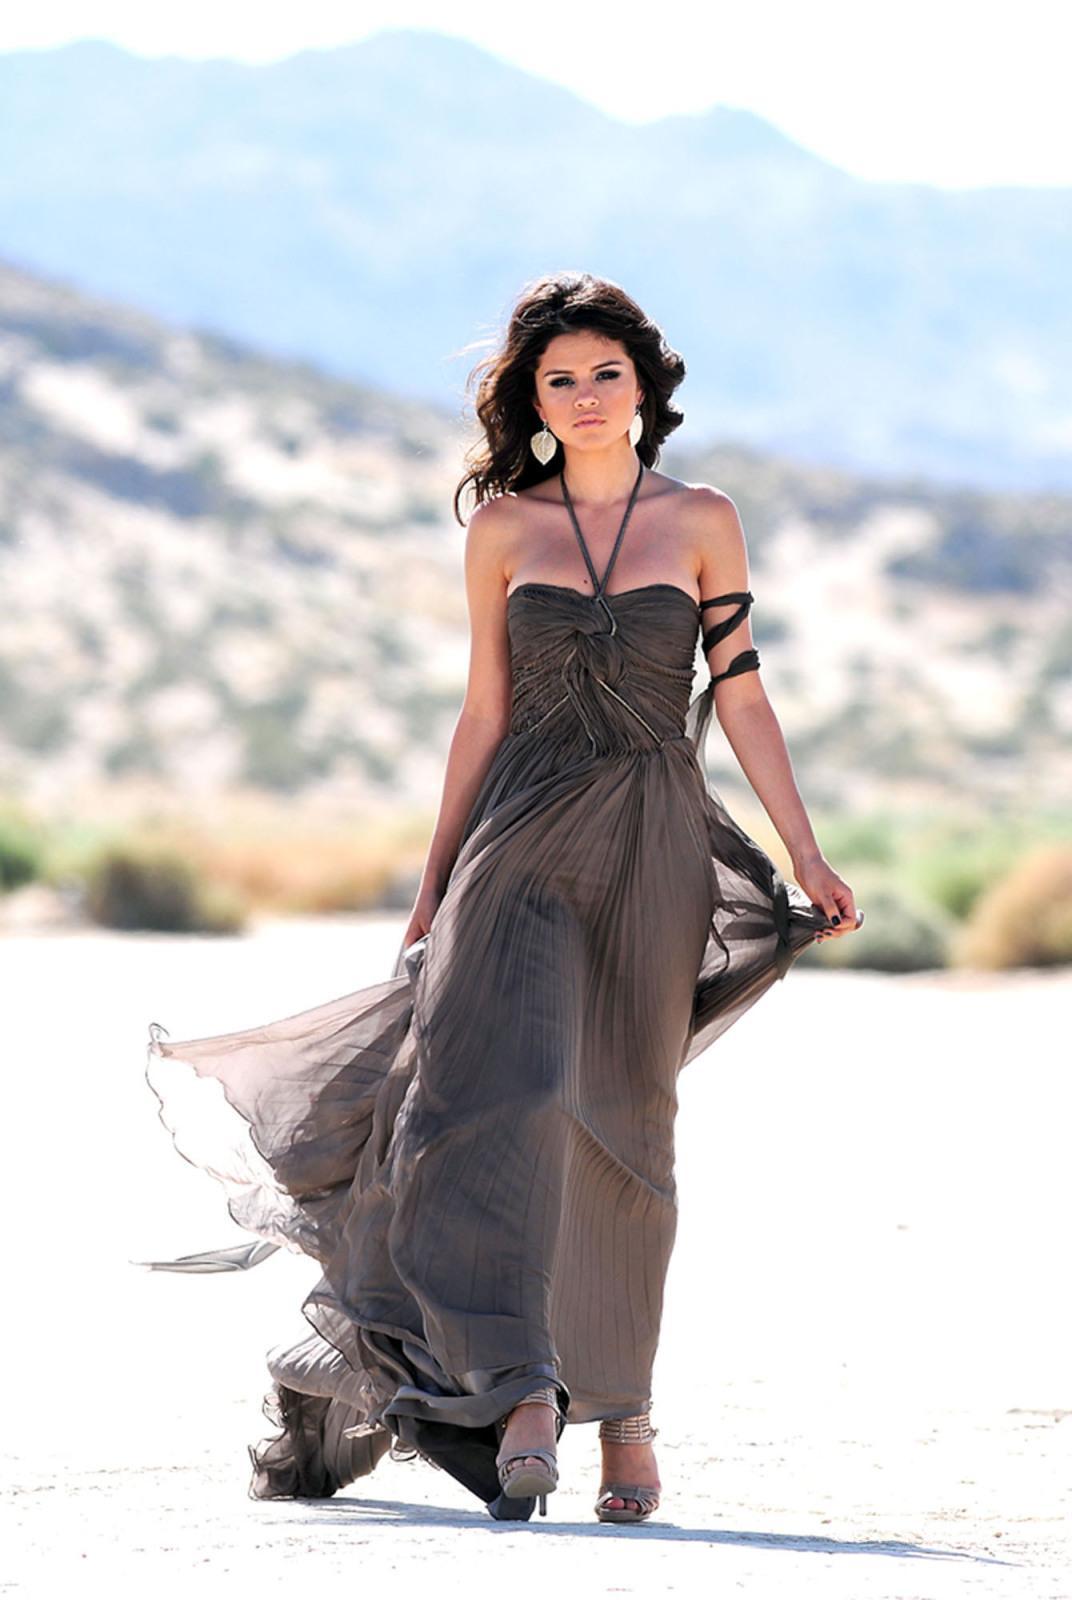 http://4.bp.blogspot.com/_yWvq_JiVYMQ/TUlrBrhJ1FI/AAAAAAAAAEY/kgRCiMMPpaY/s1600/Selena_Gomez11.jpg